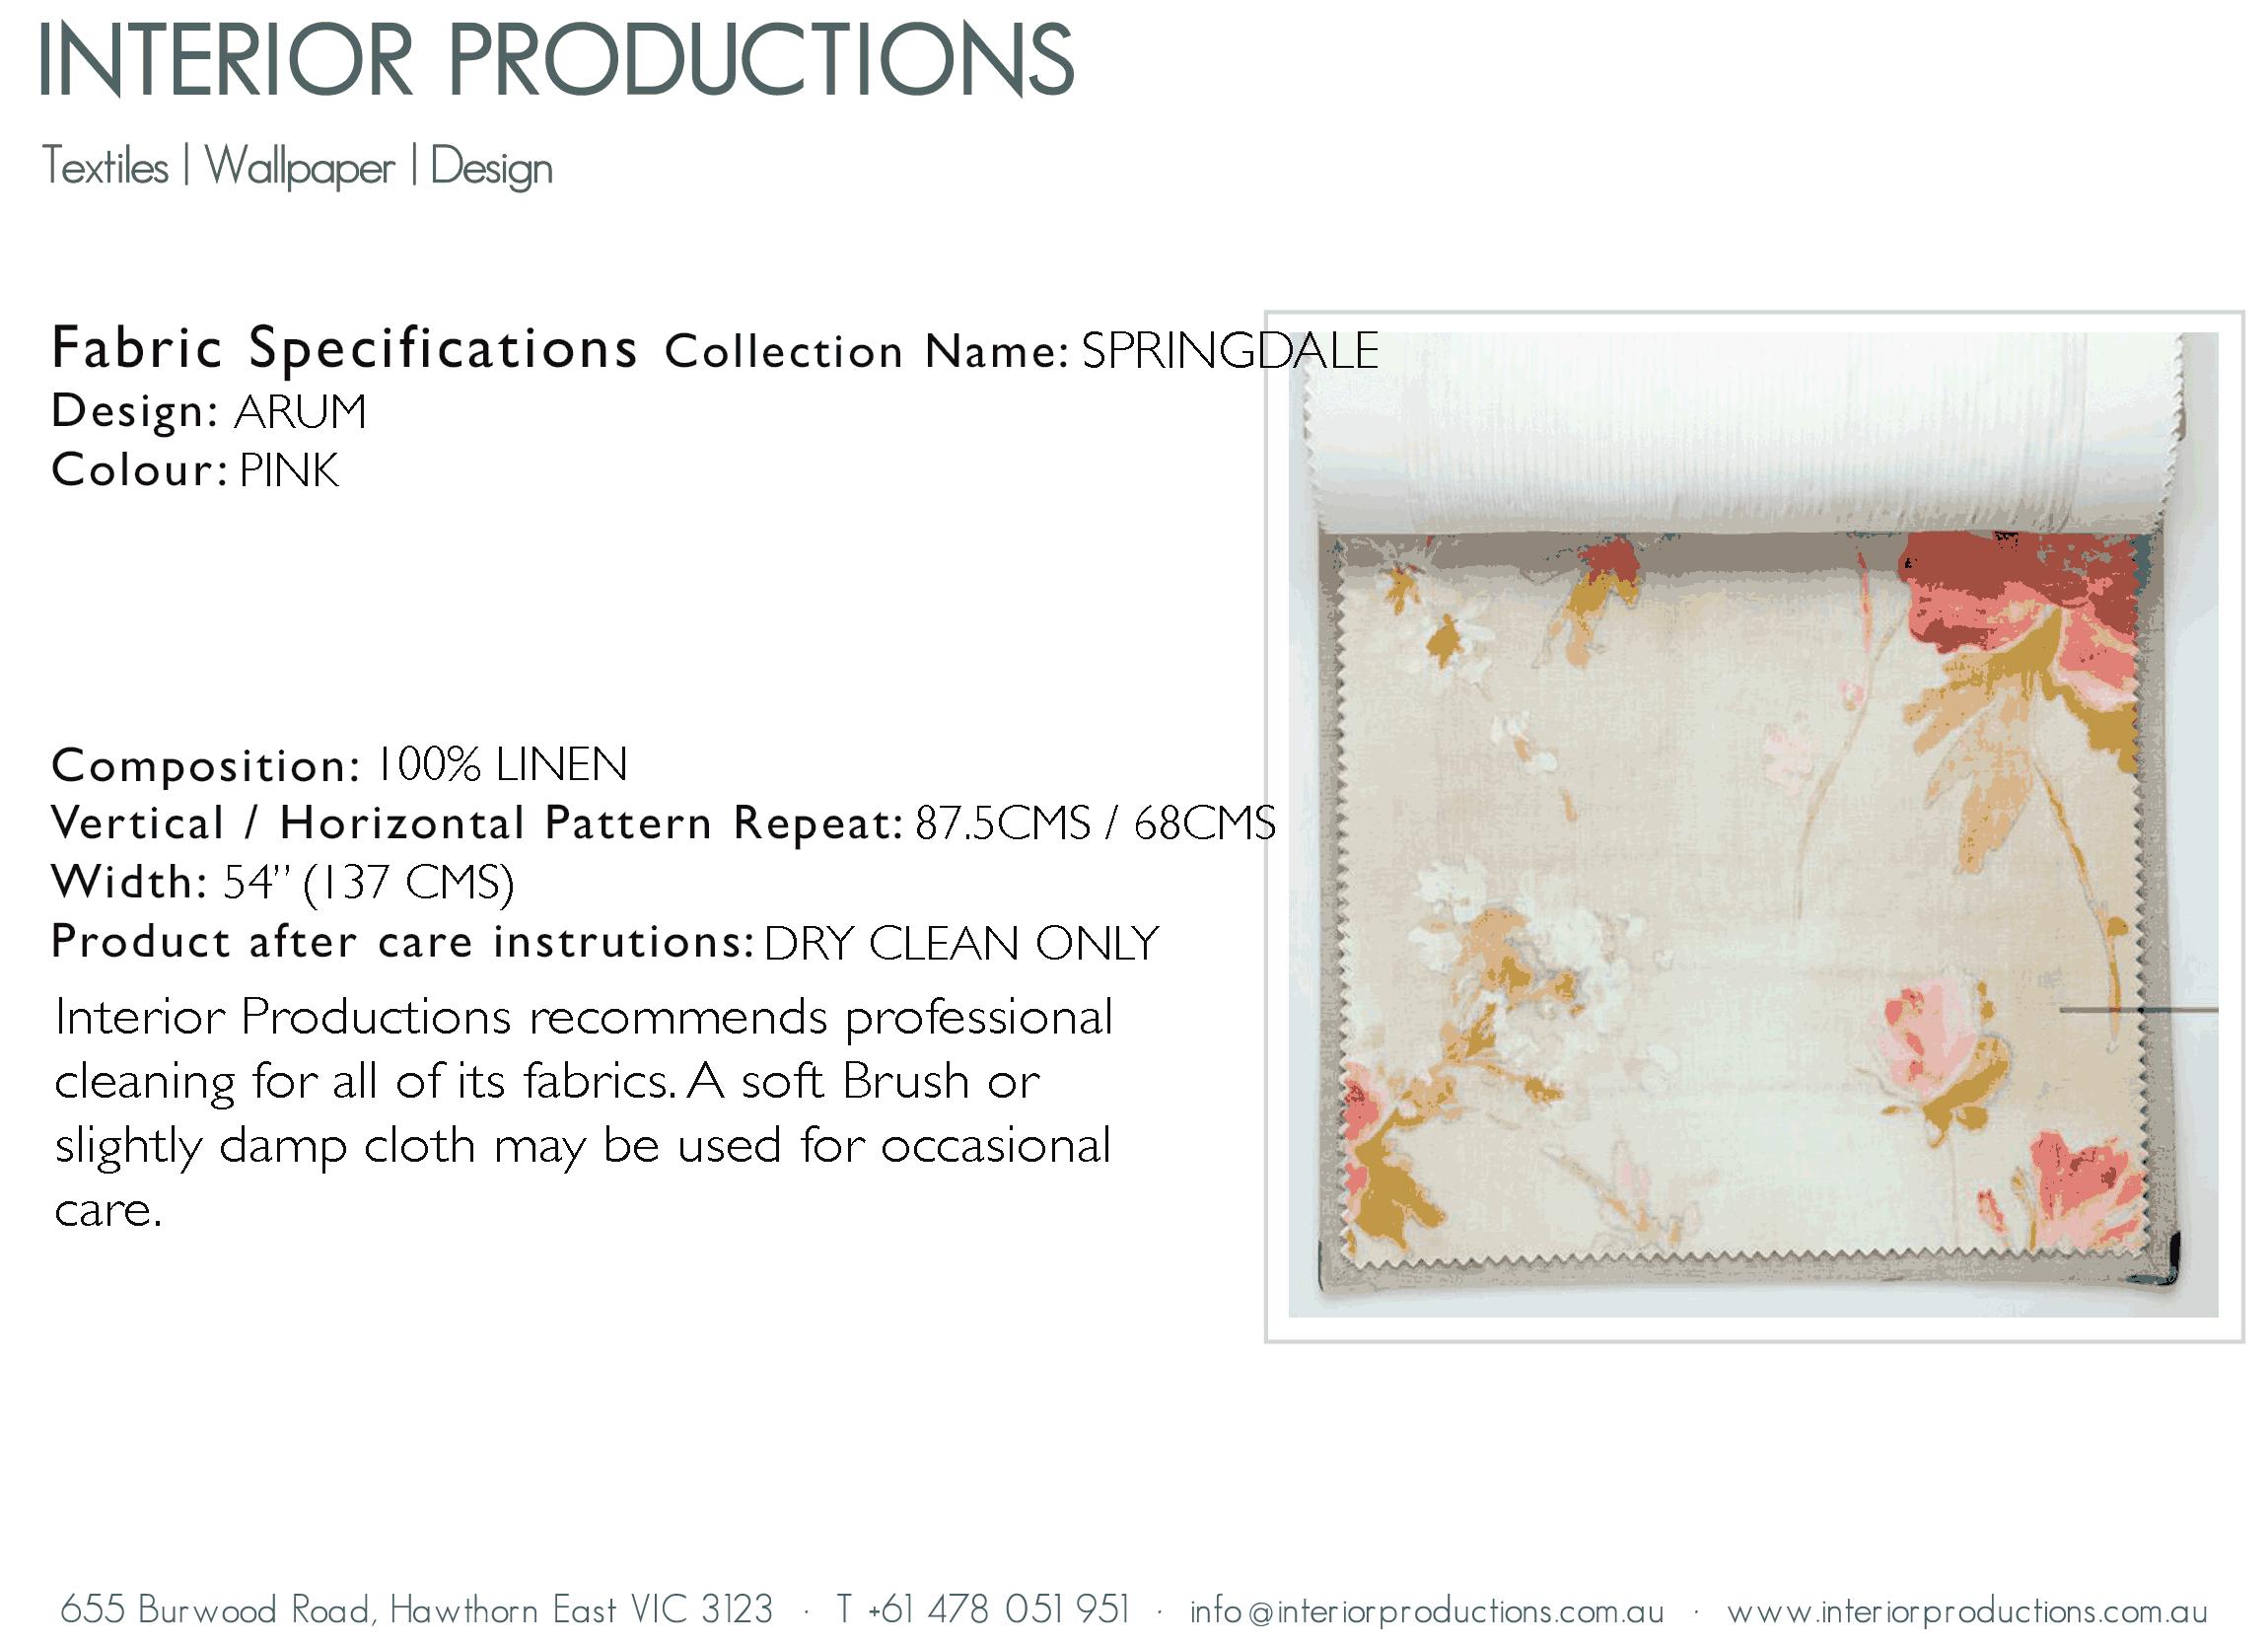 interior_productions_ARUM---PINK